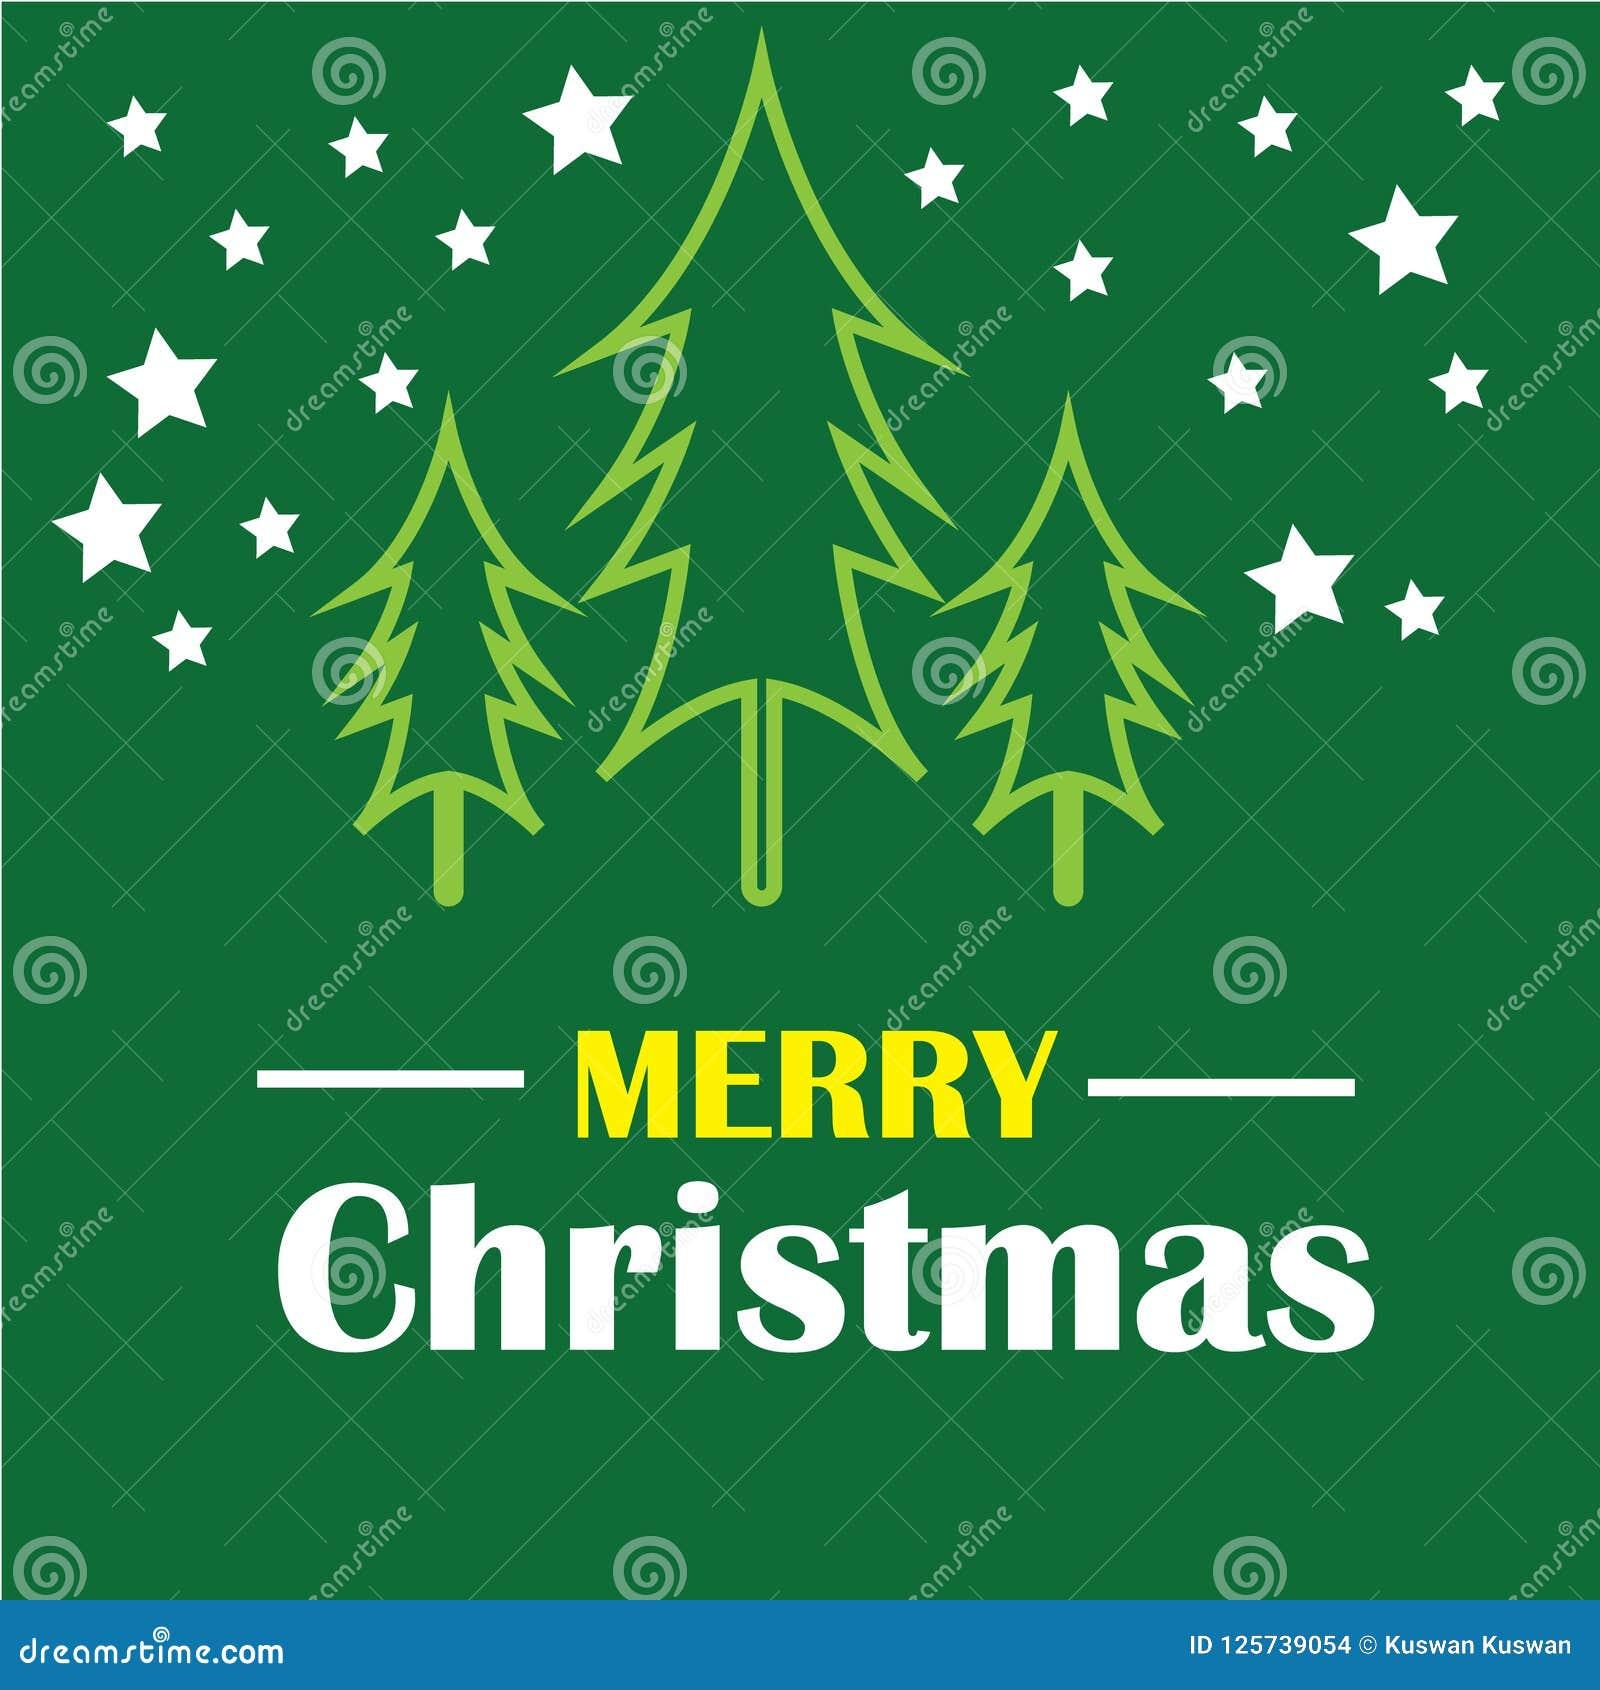 Christmas Green Color.Merry Christmas Template Design For Religion Editable Eps